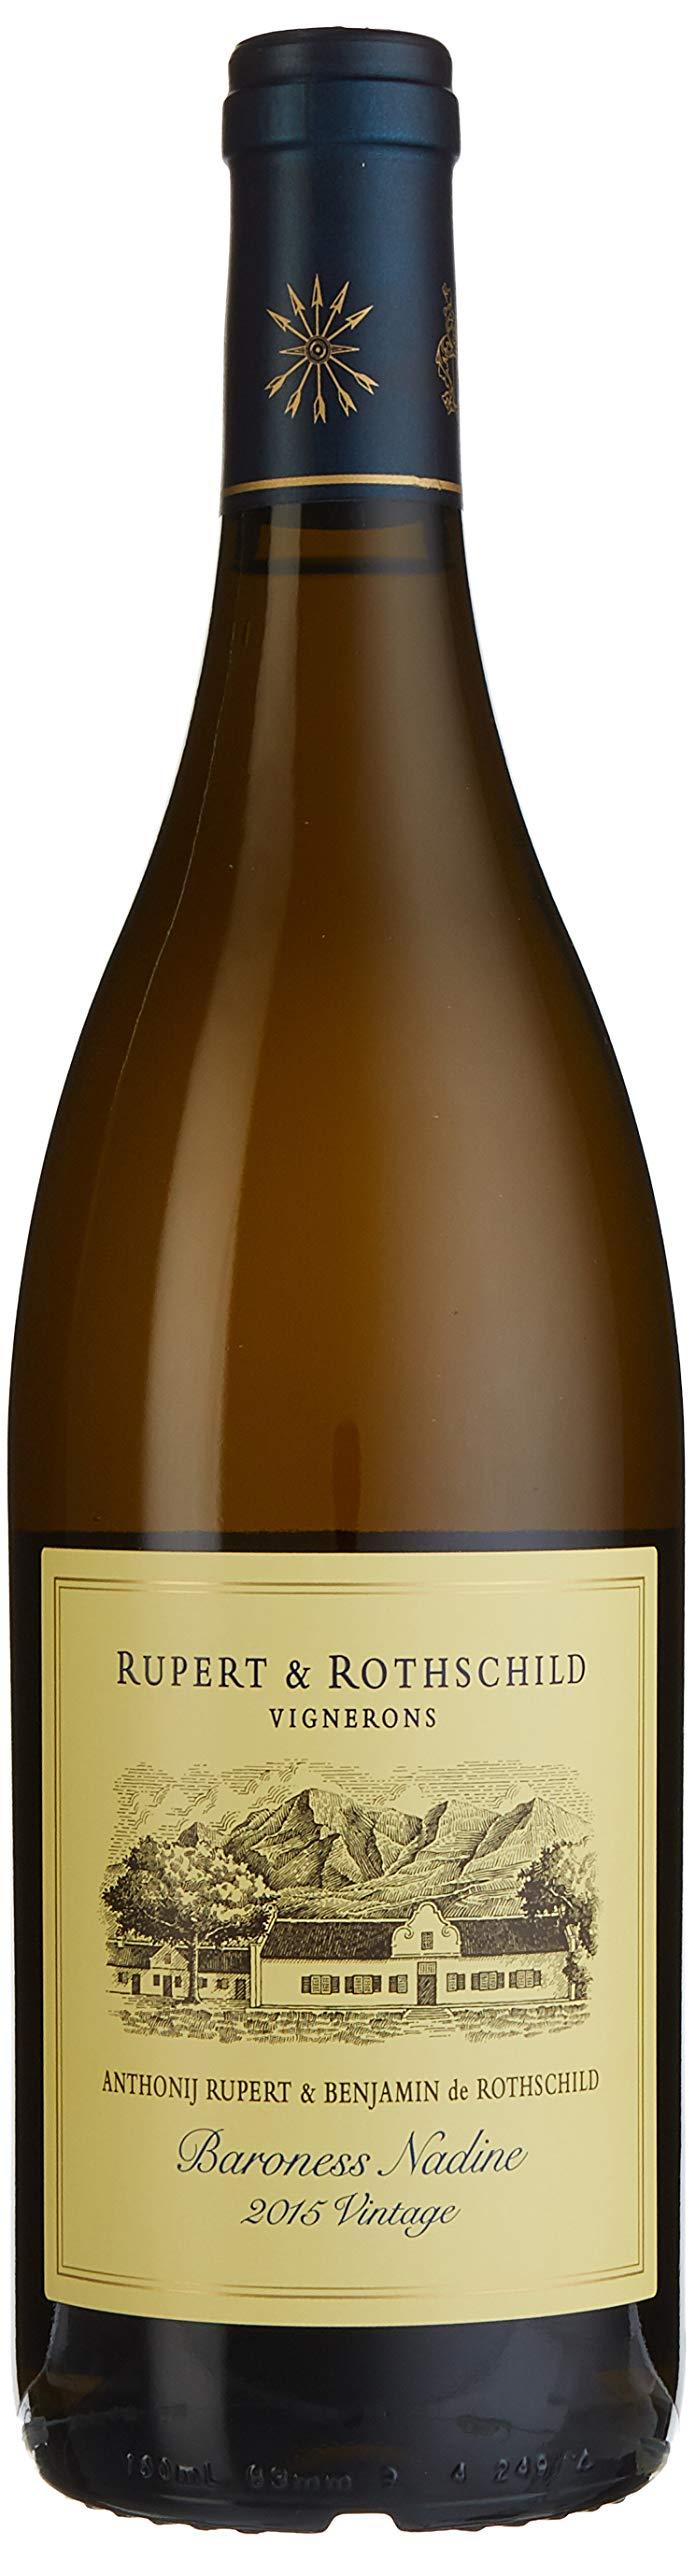 Rupert-Rothschild-Baroness-Nadine-Chardonnay-trocken-1-x-075-l